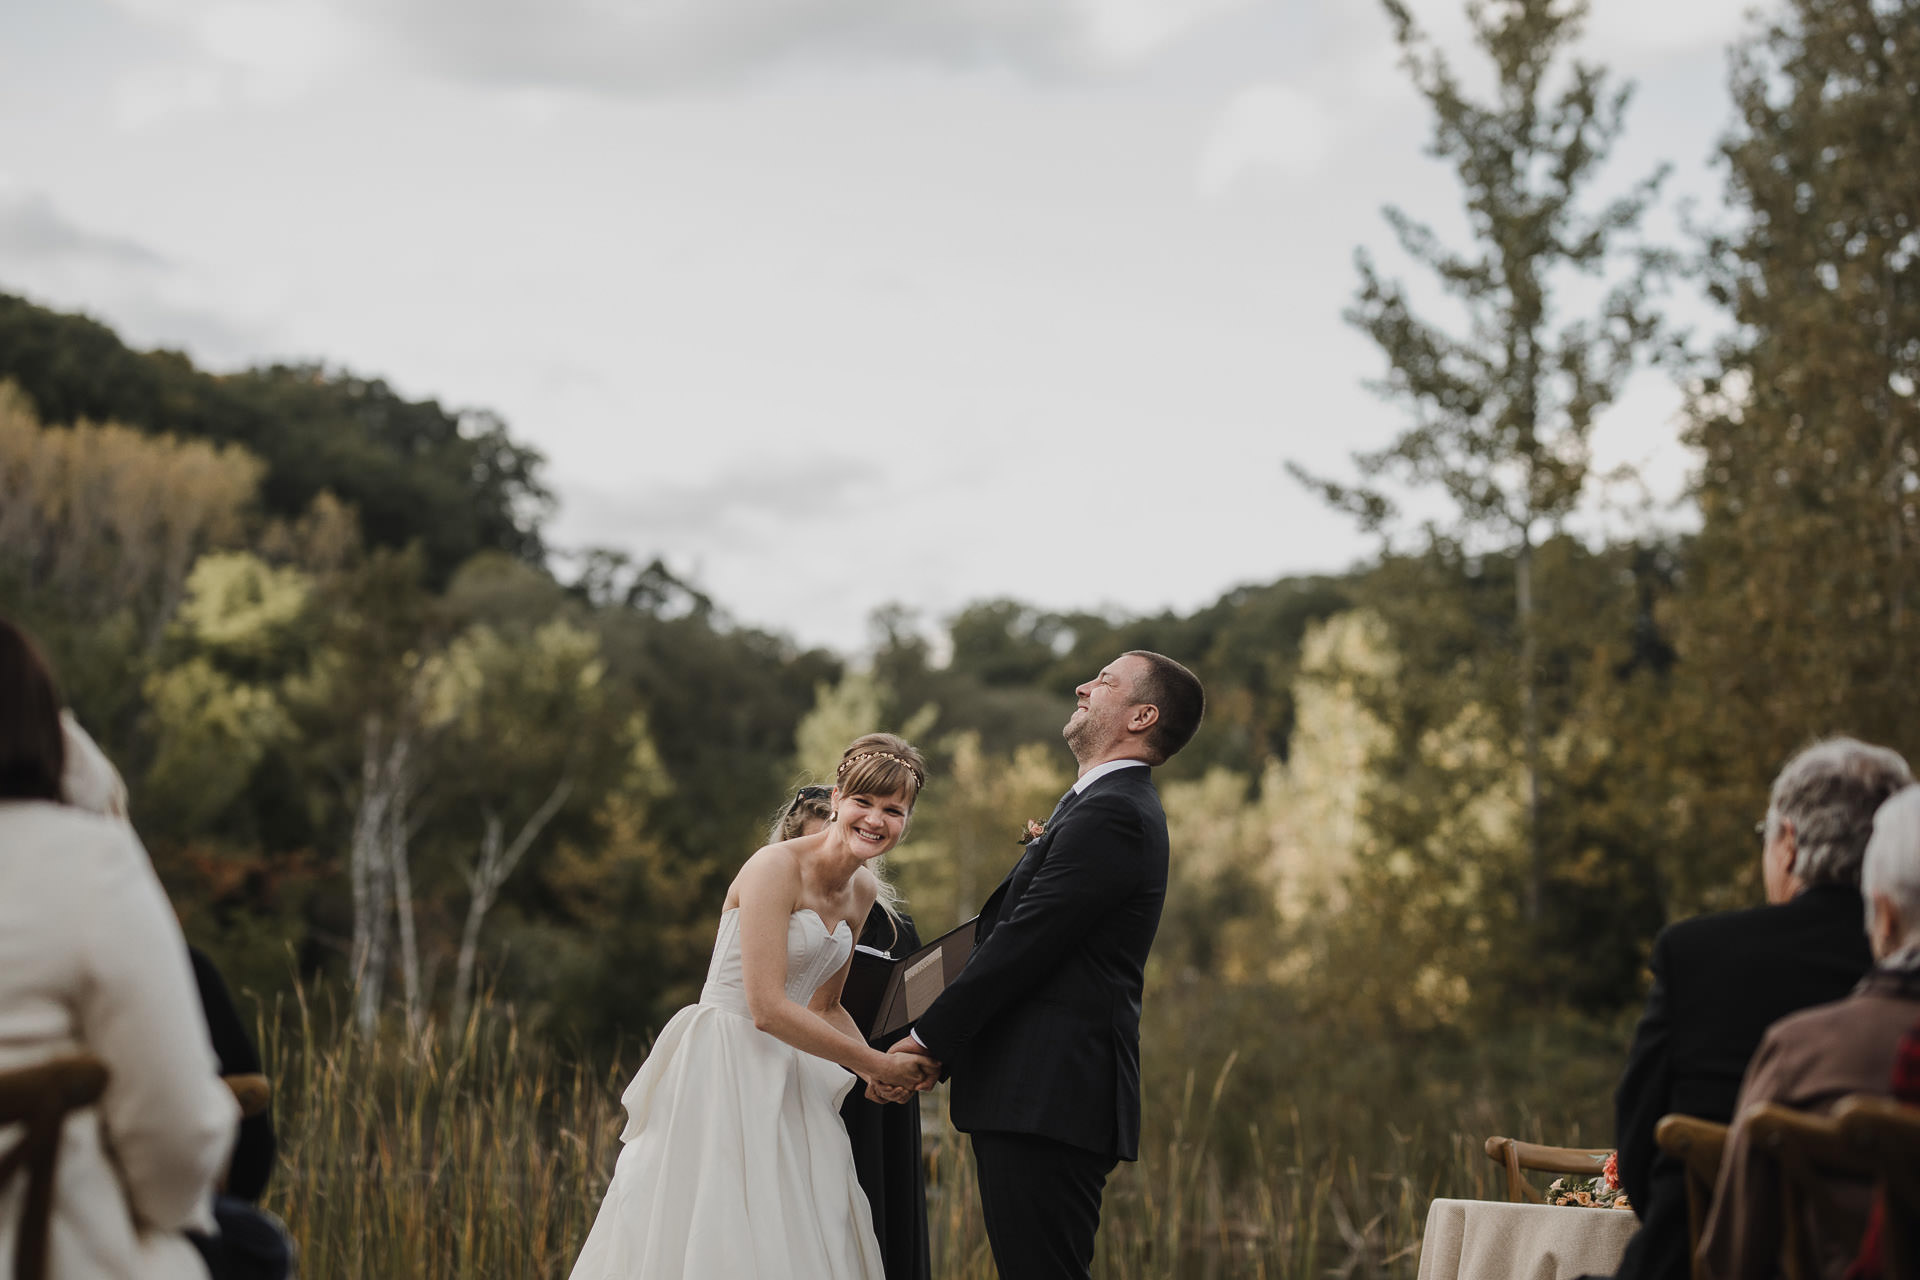 Evergreen Brickworks wedding photographer - bride and groom laughing